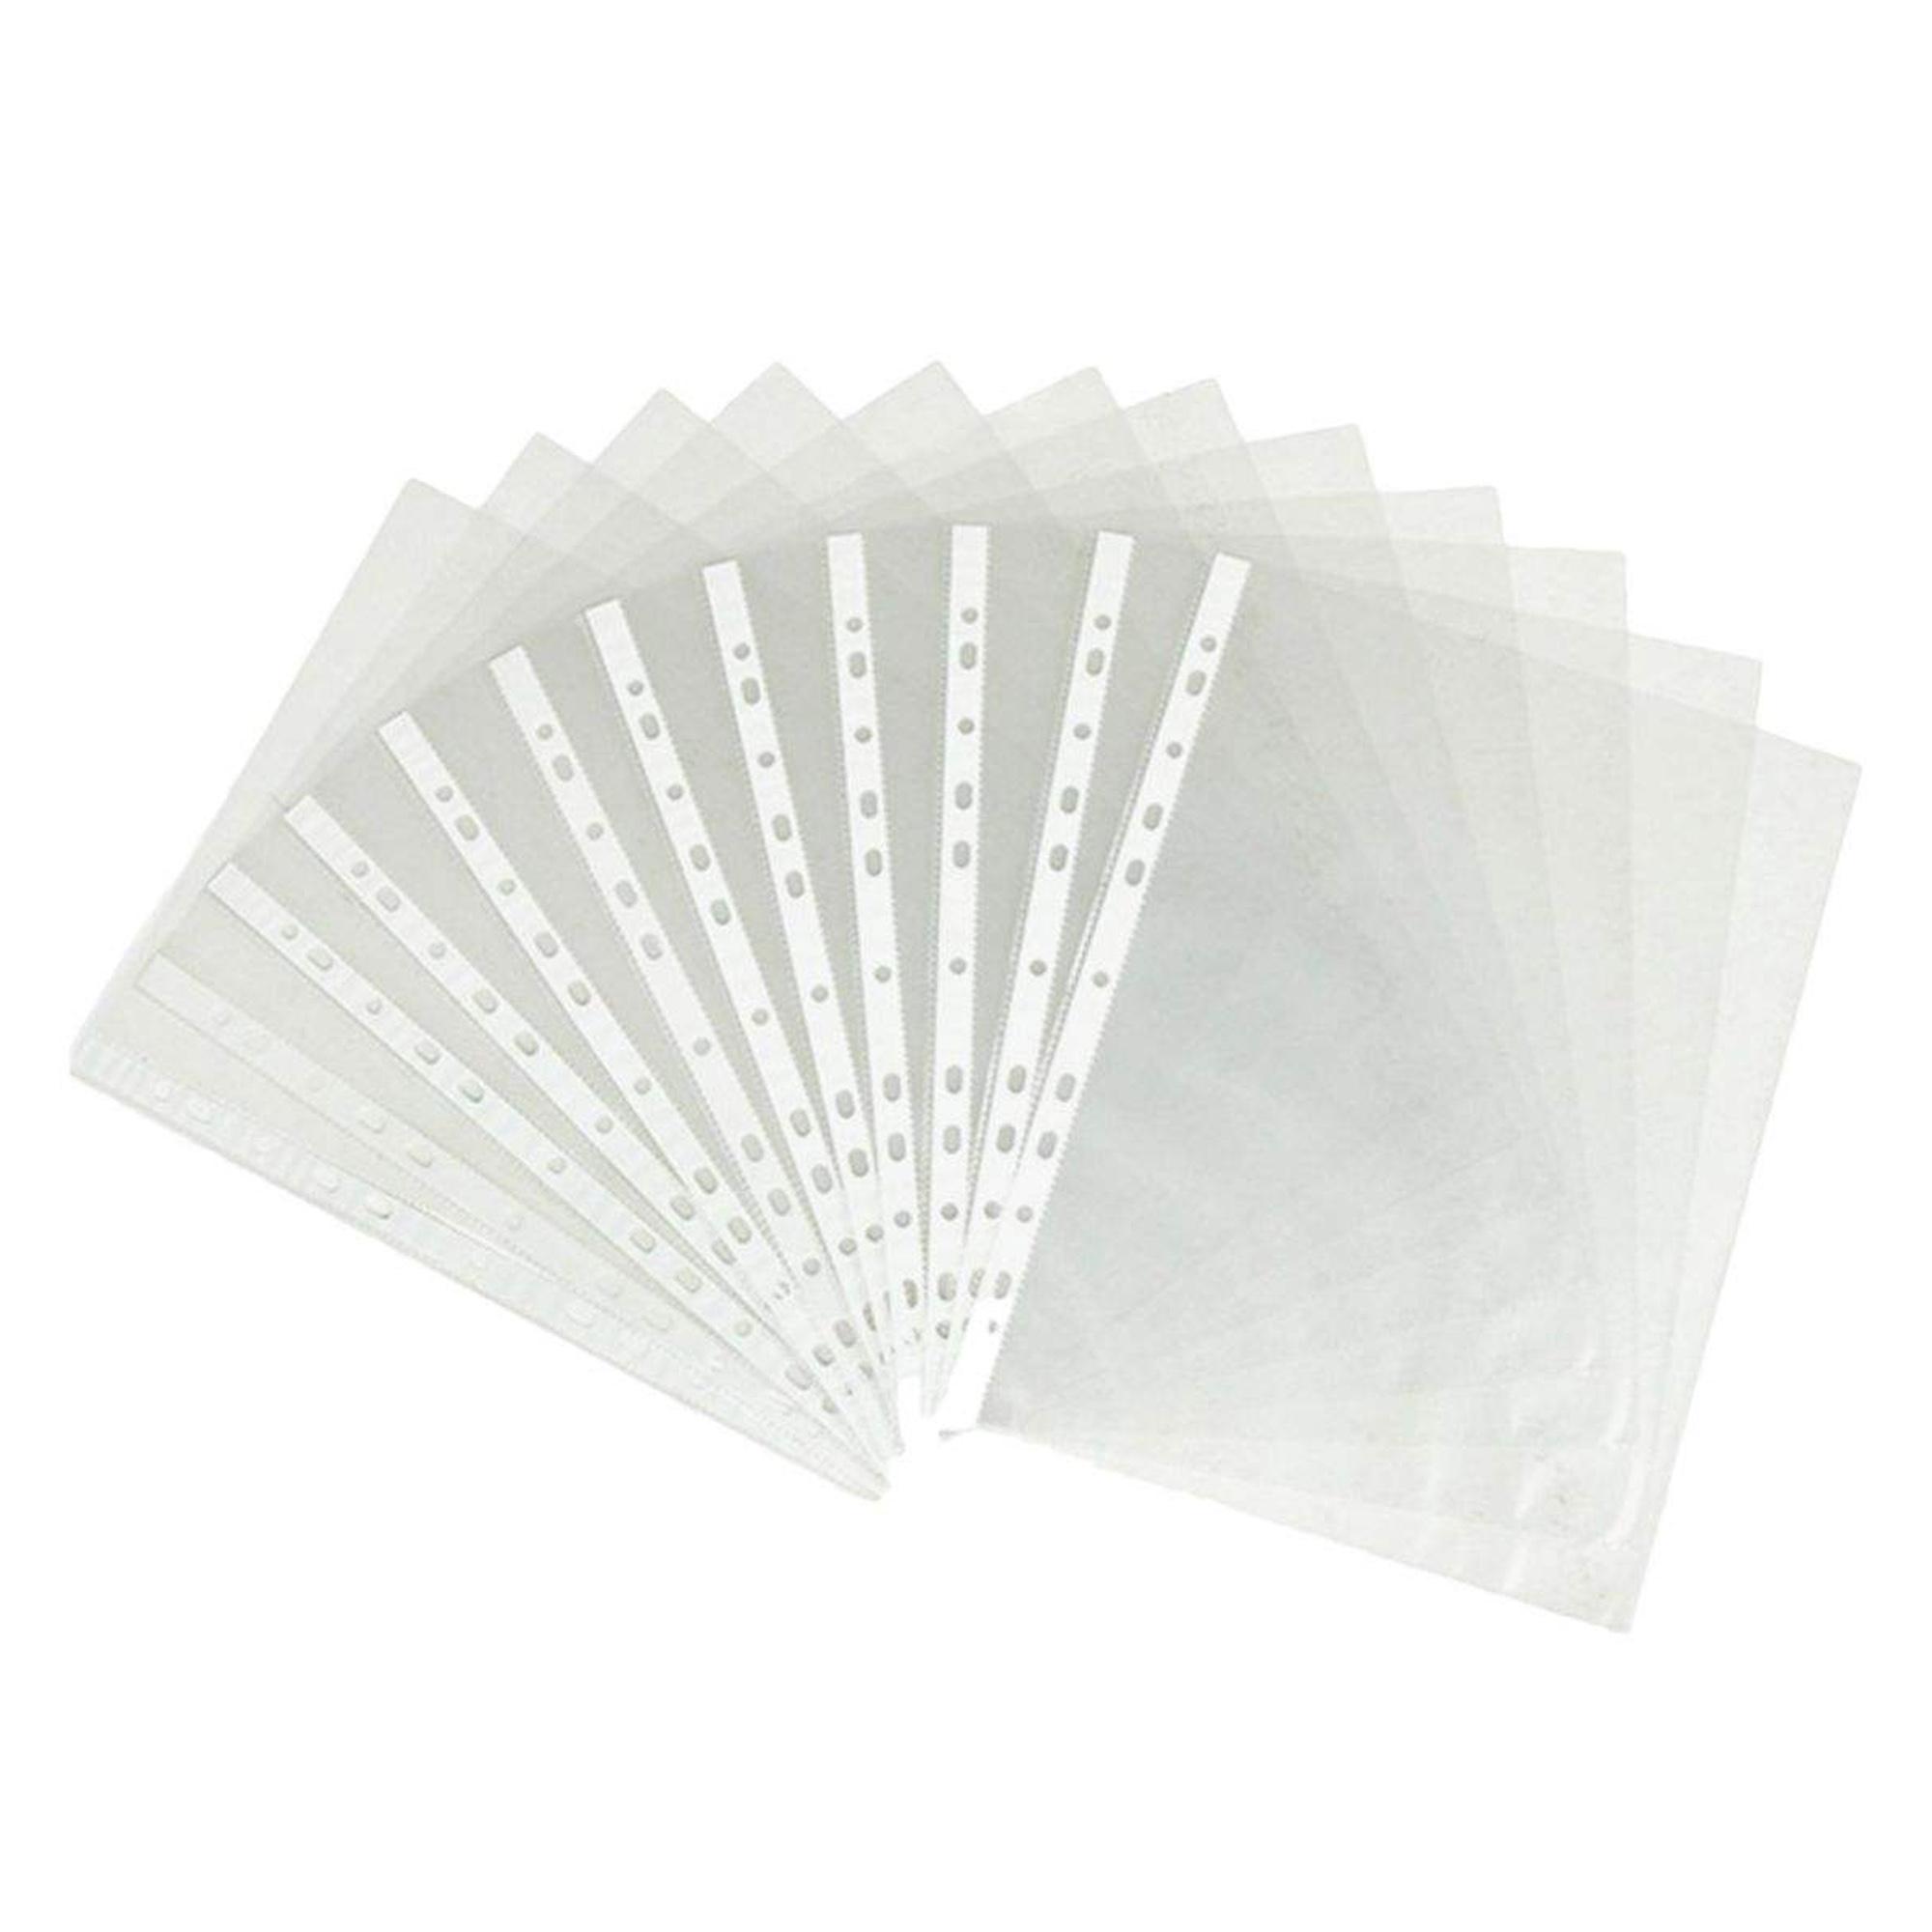 قیمت خرید کاور کاغذ A4 آفیس کد 110 بسته 100 عددی اورجینال